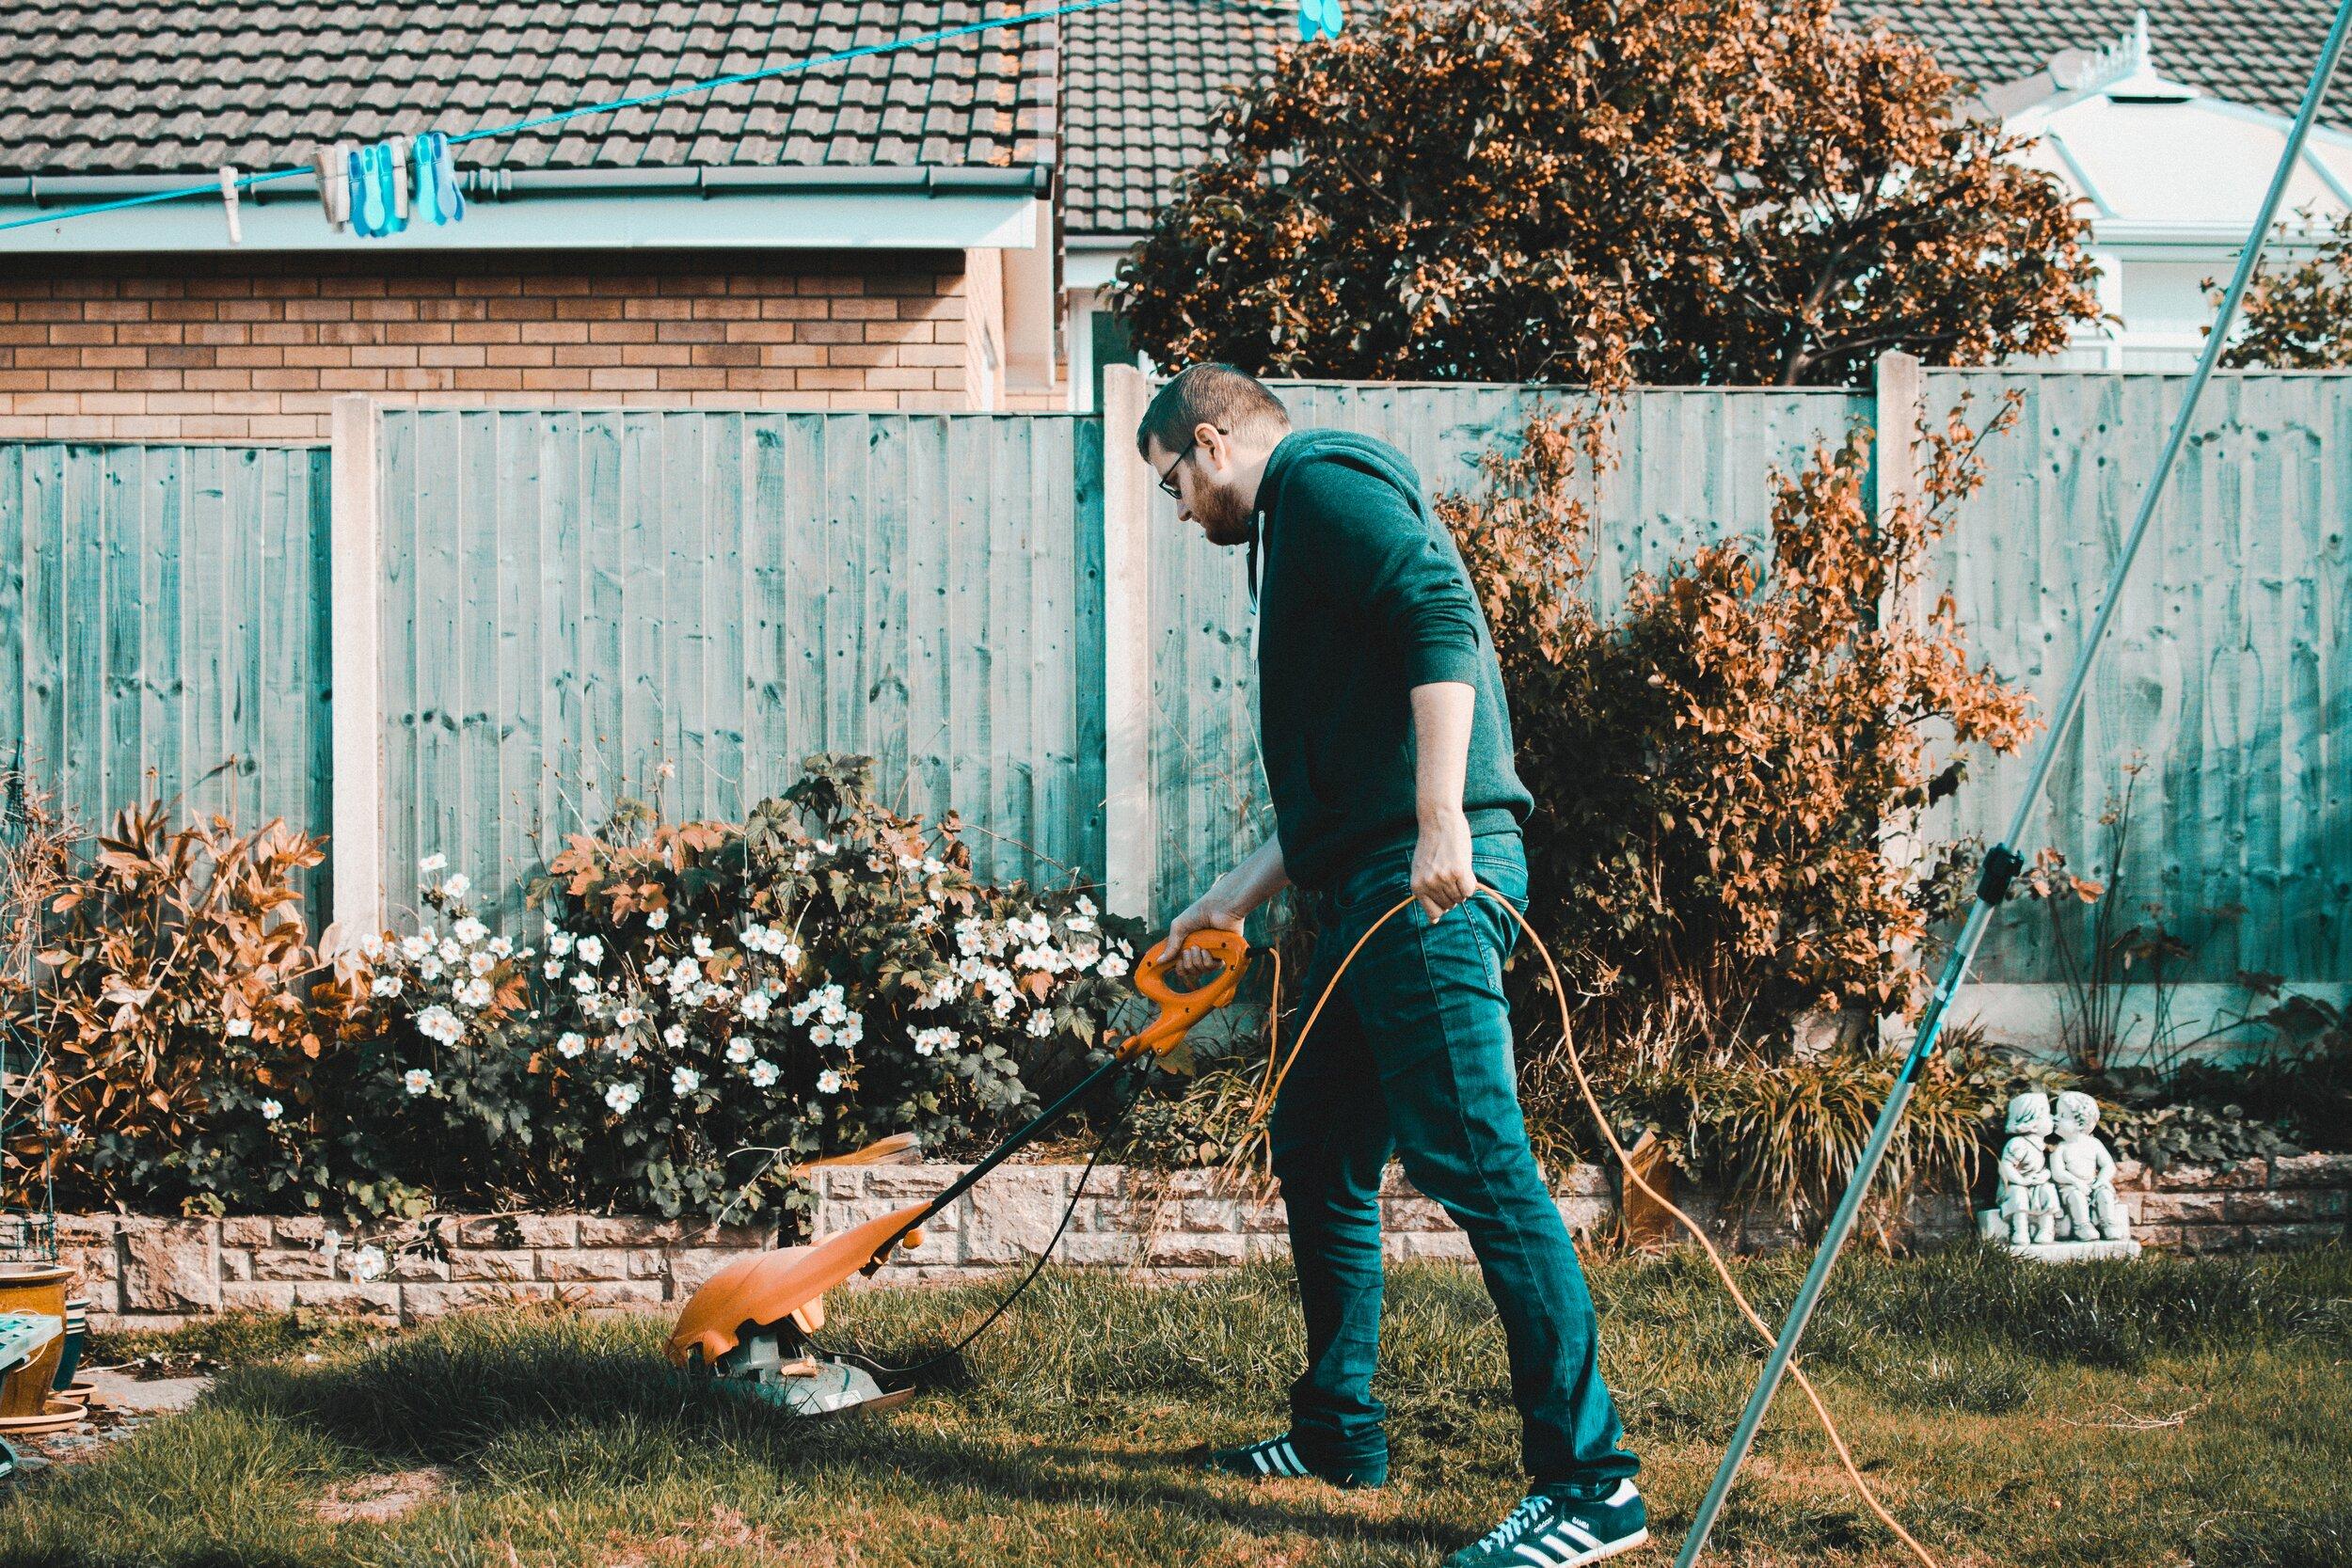 https://www.pexels.com/photo/man-holding-orange-electric-grass-cutter-on-lawn-1453499/